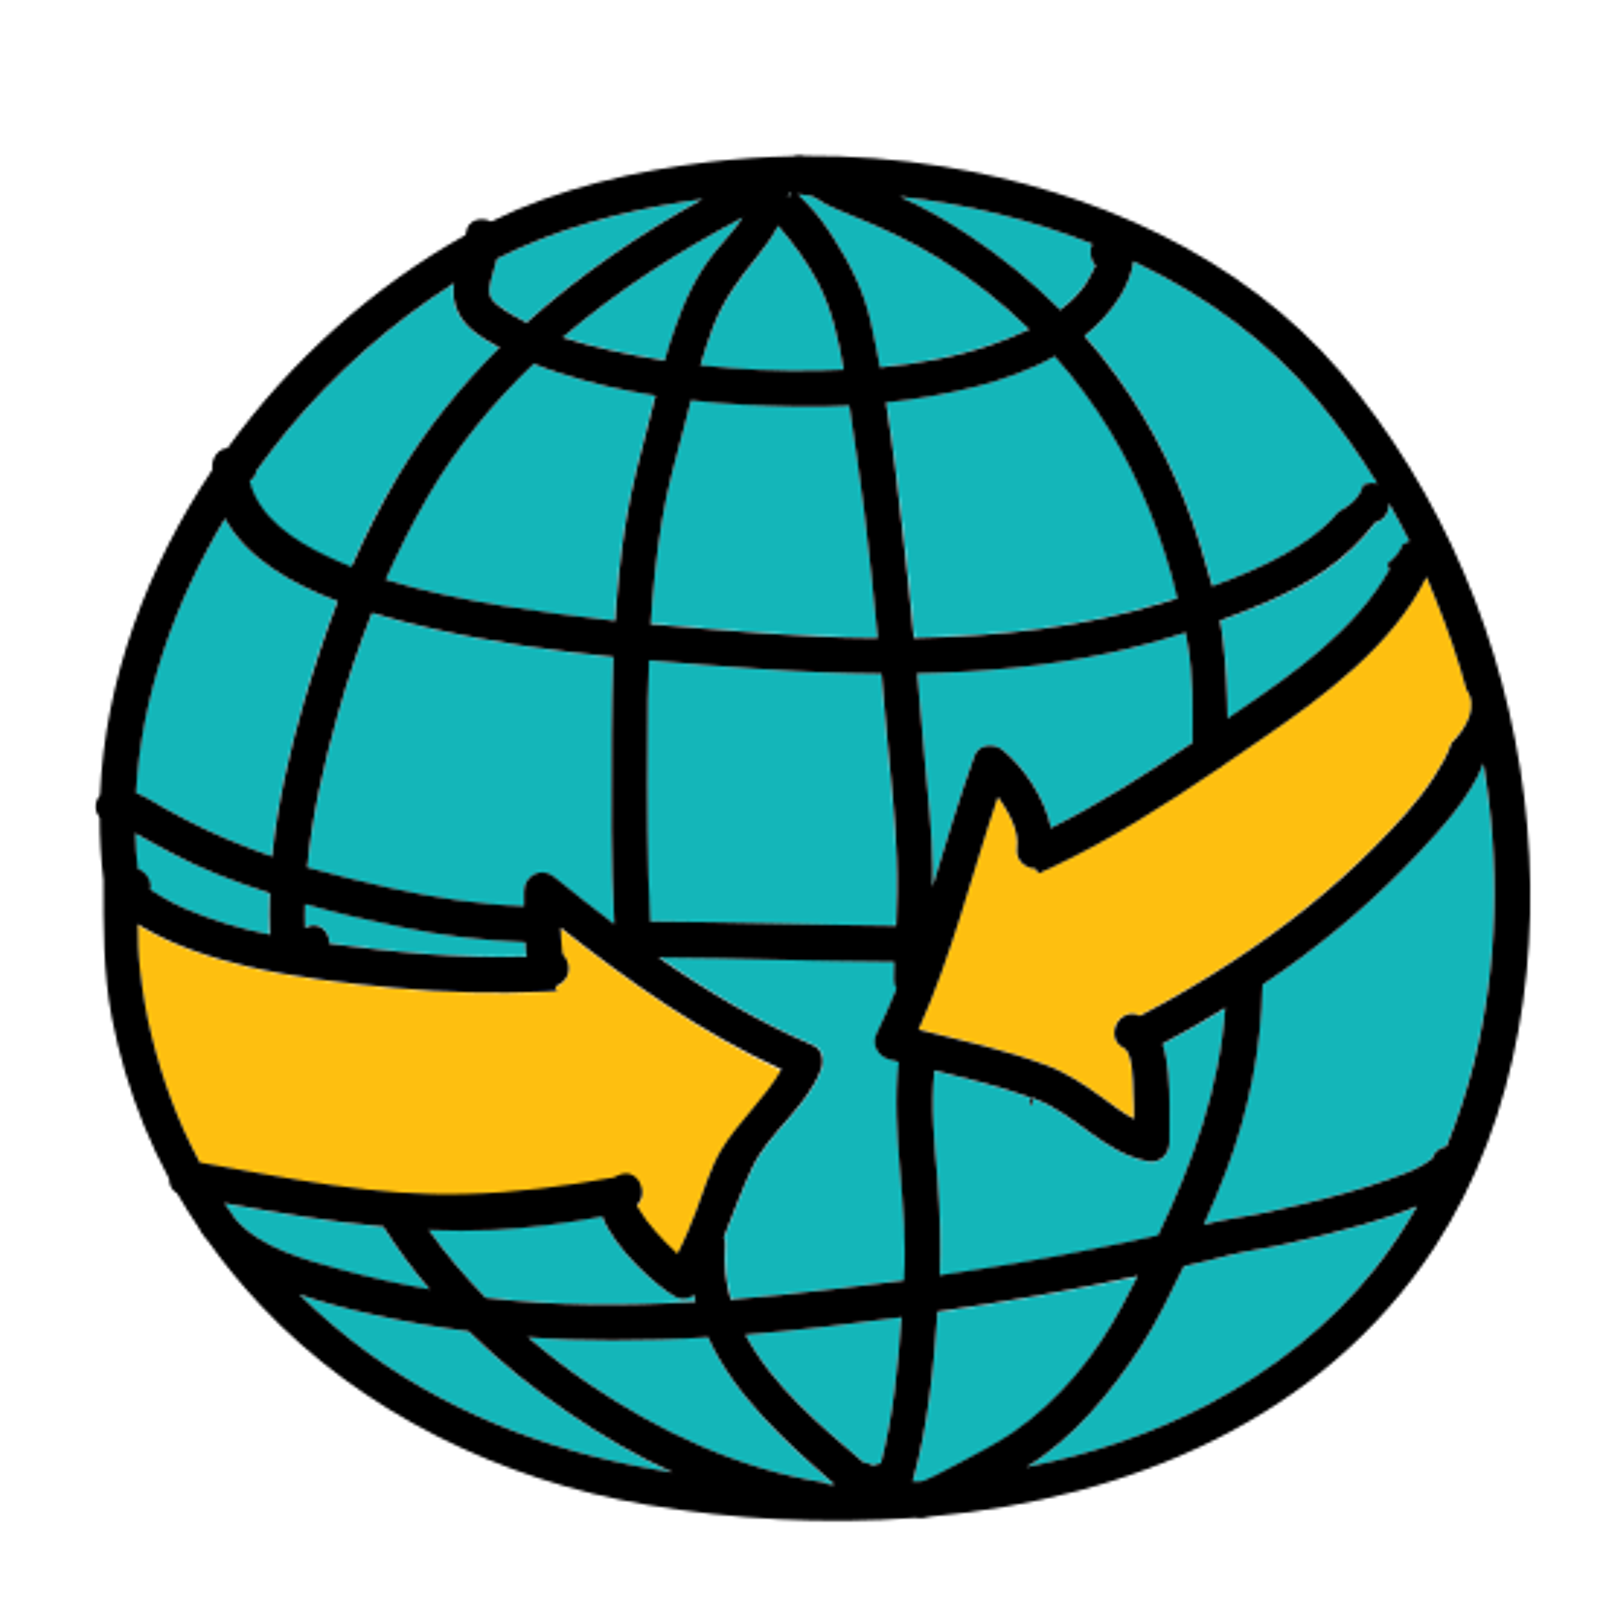 Meeting Arrows Globe icon